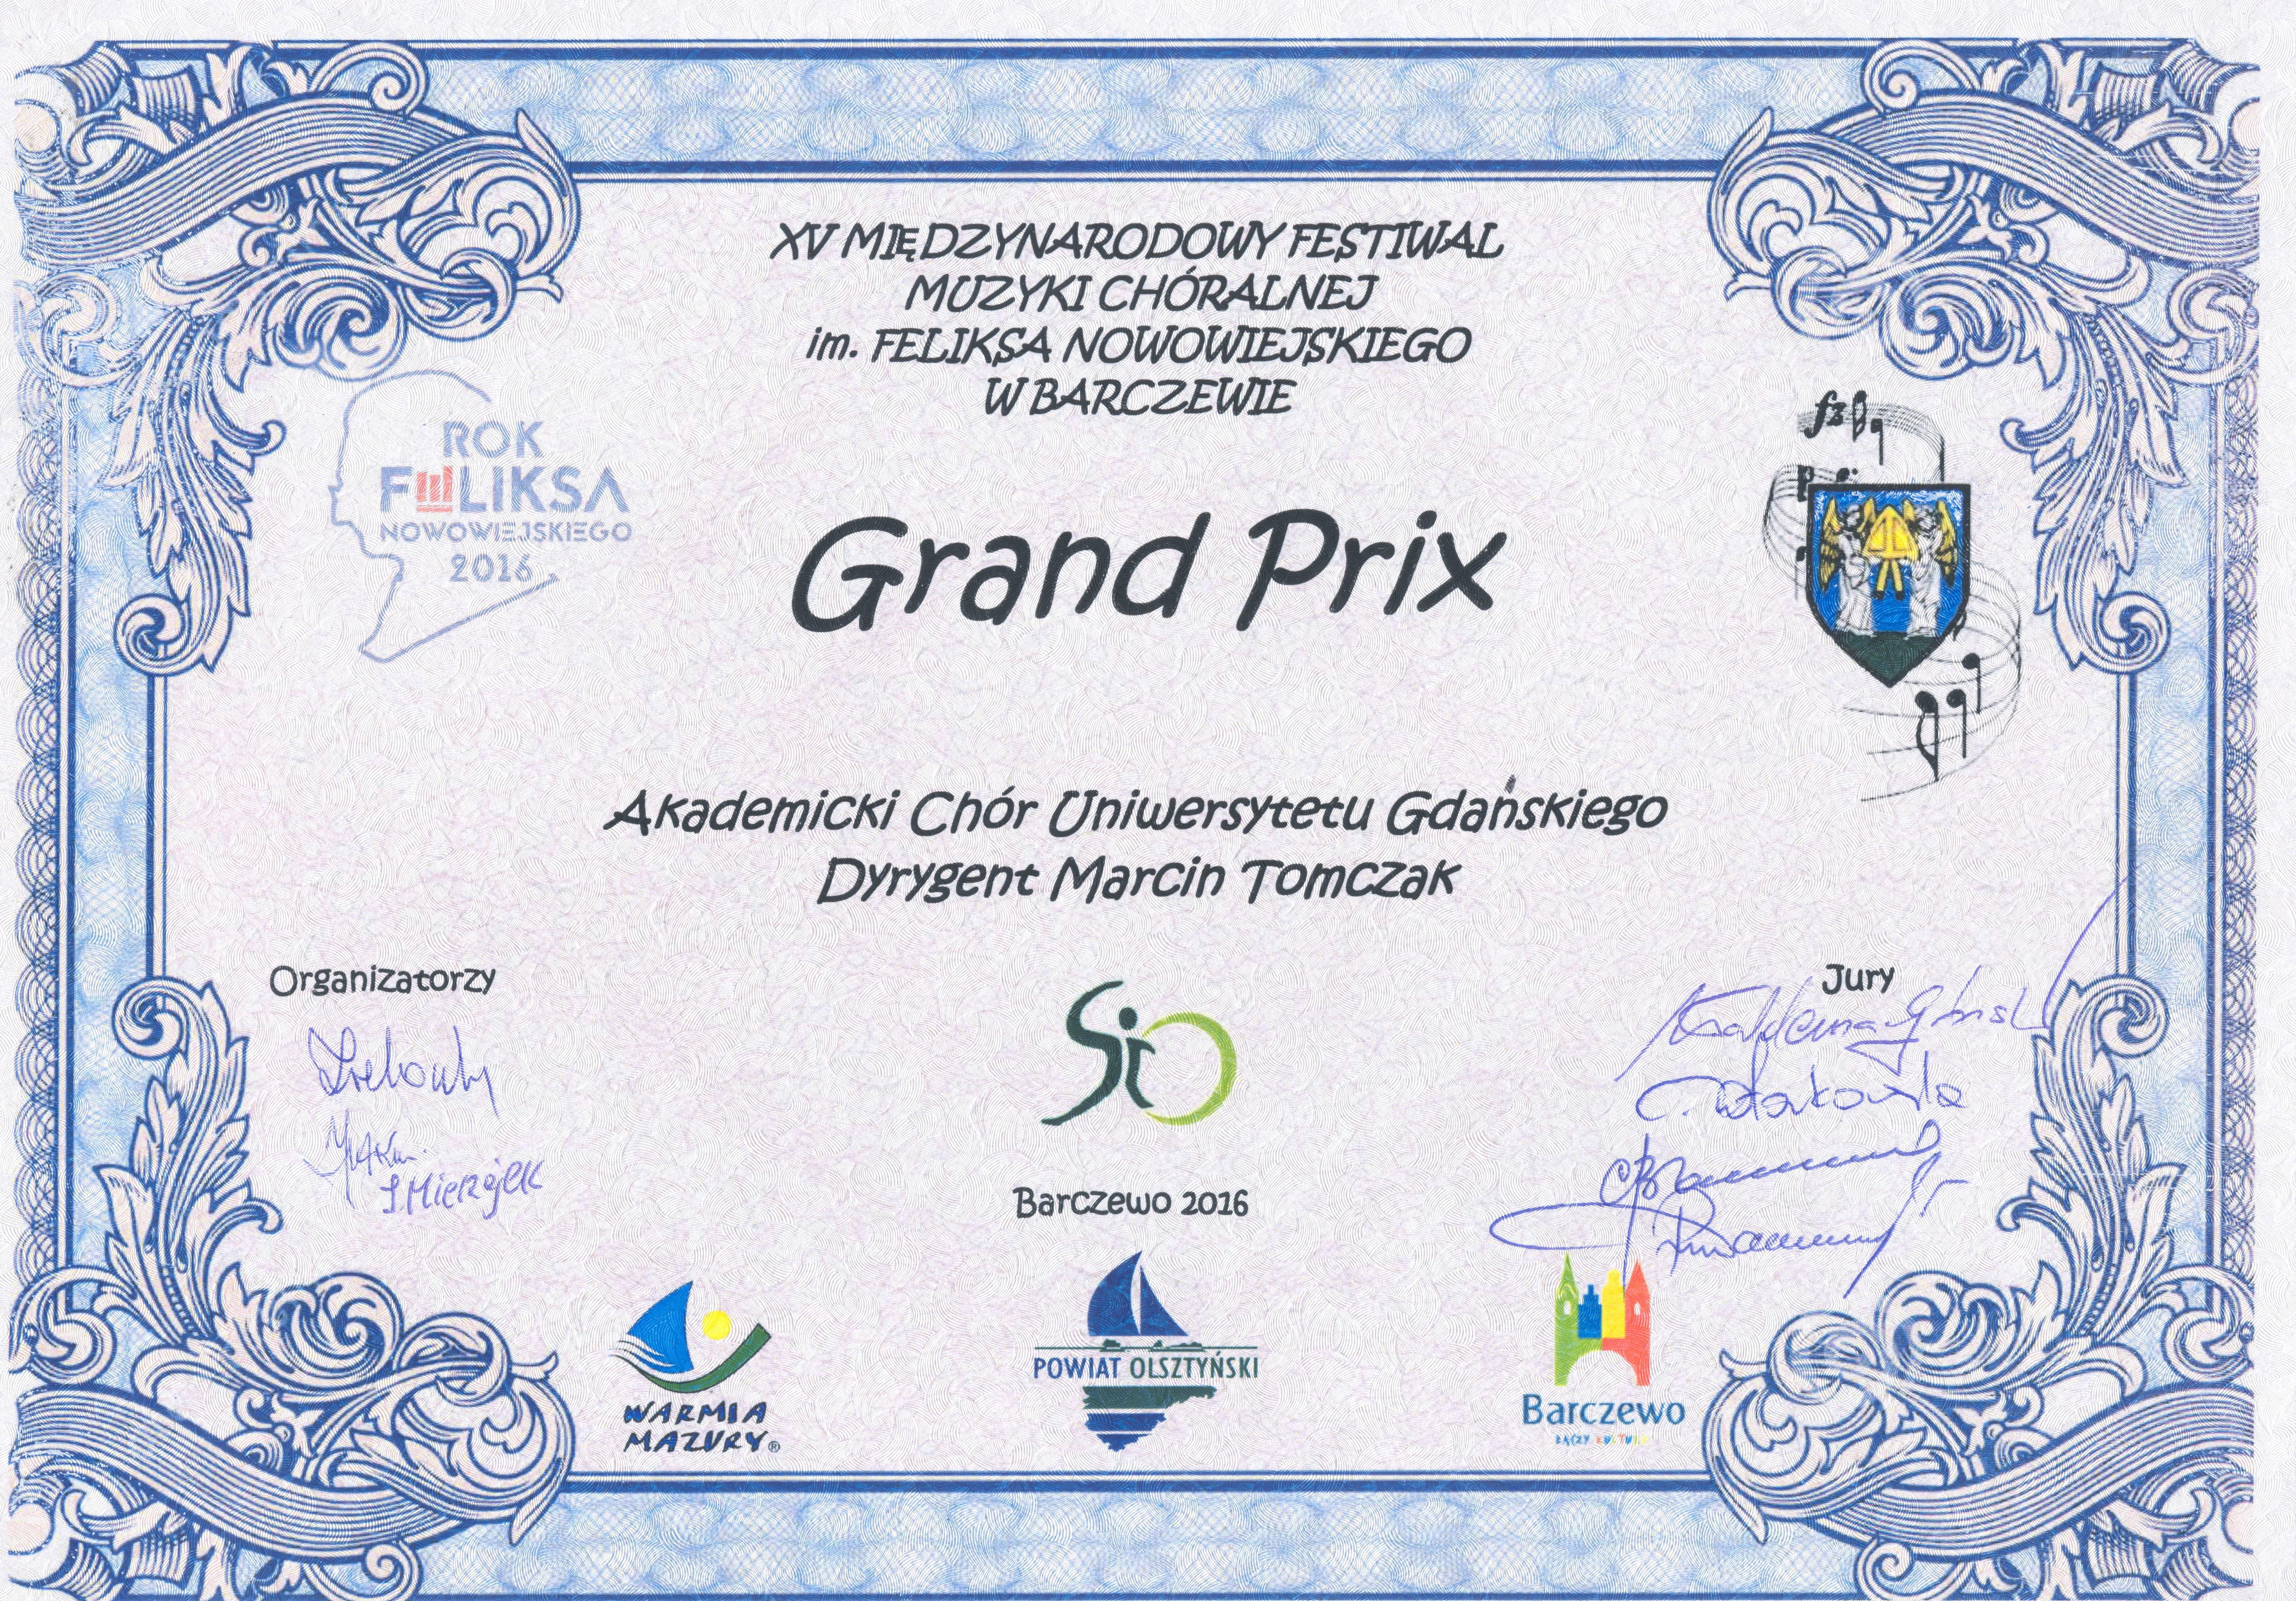 UG_Grand_Prix_Barczewo_2016